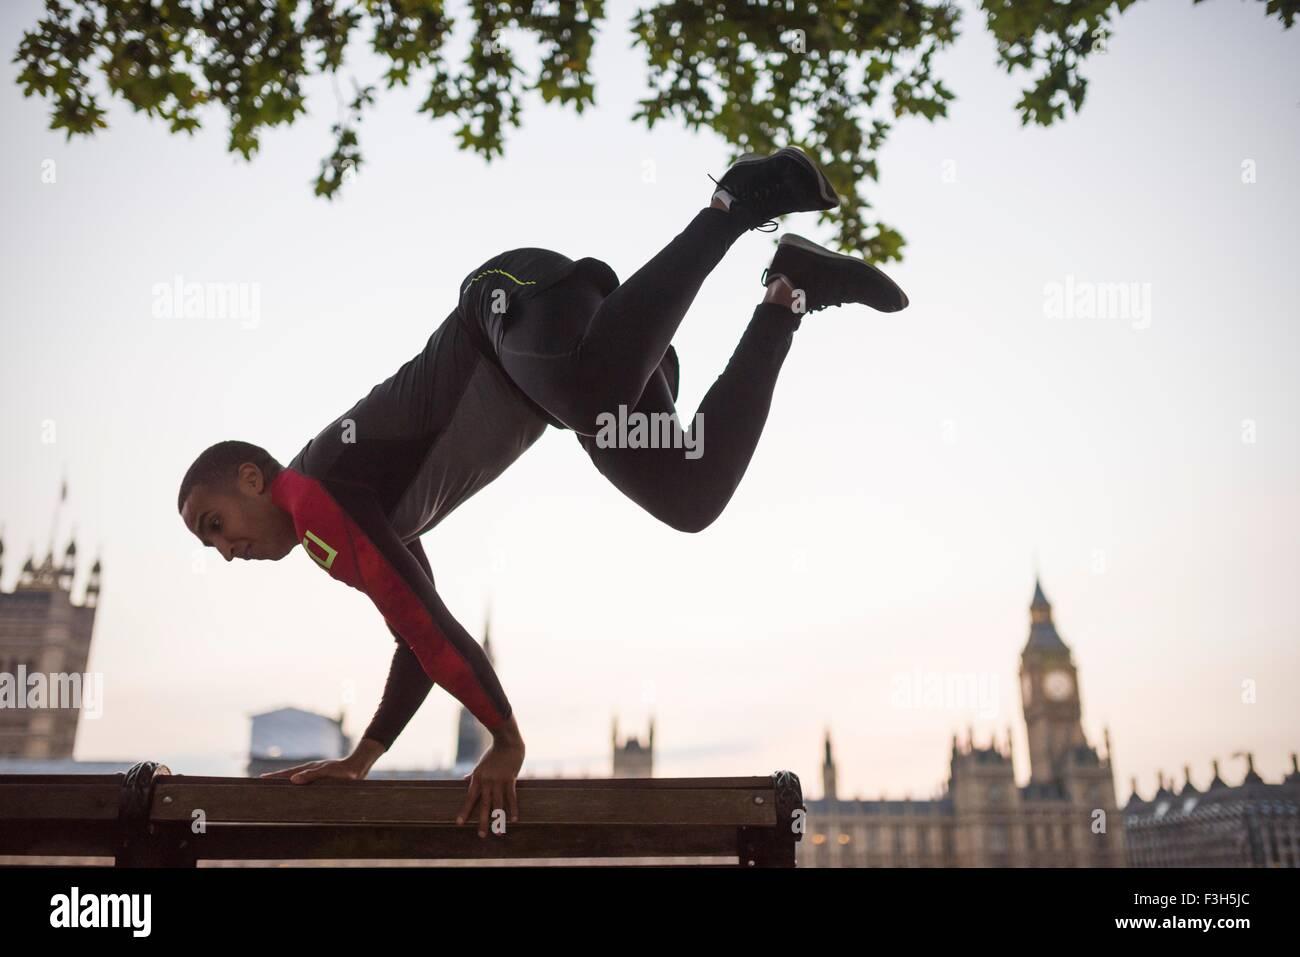 Junger Mann springen über Parkbank am Southbank, London, UK Stockbild